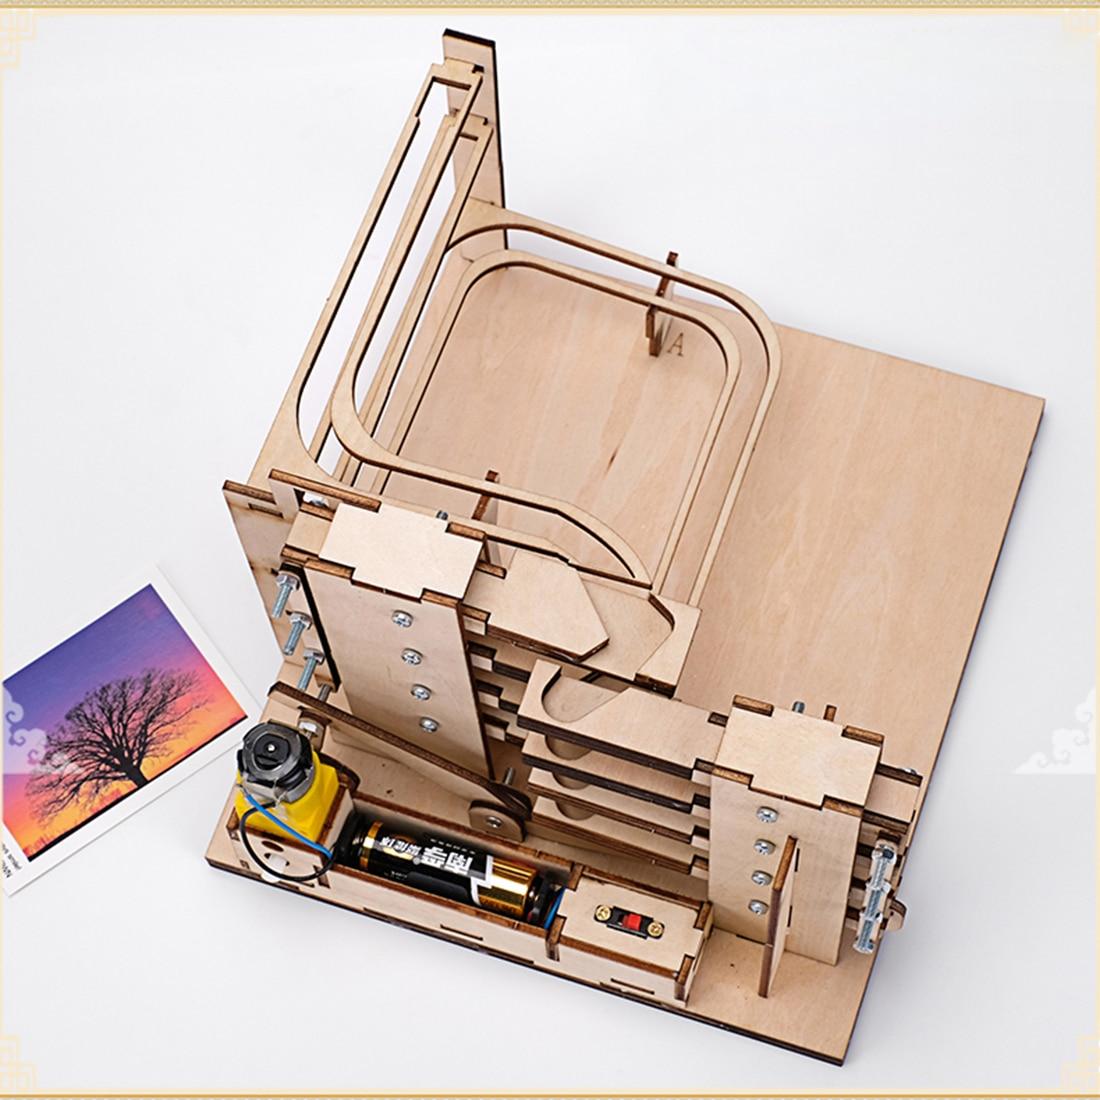 H1ab7419458a6409bbd3ef9290c968ea6q - Robotime - DIY Models, DIY Miniature Houses, 3d Wooden Puzzle